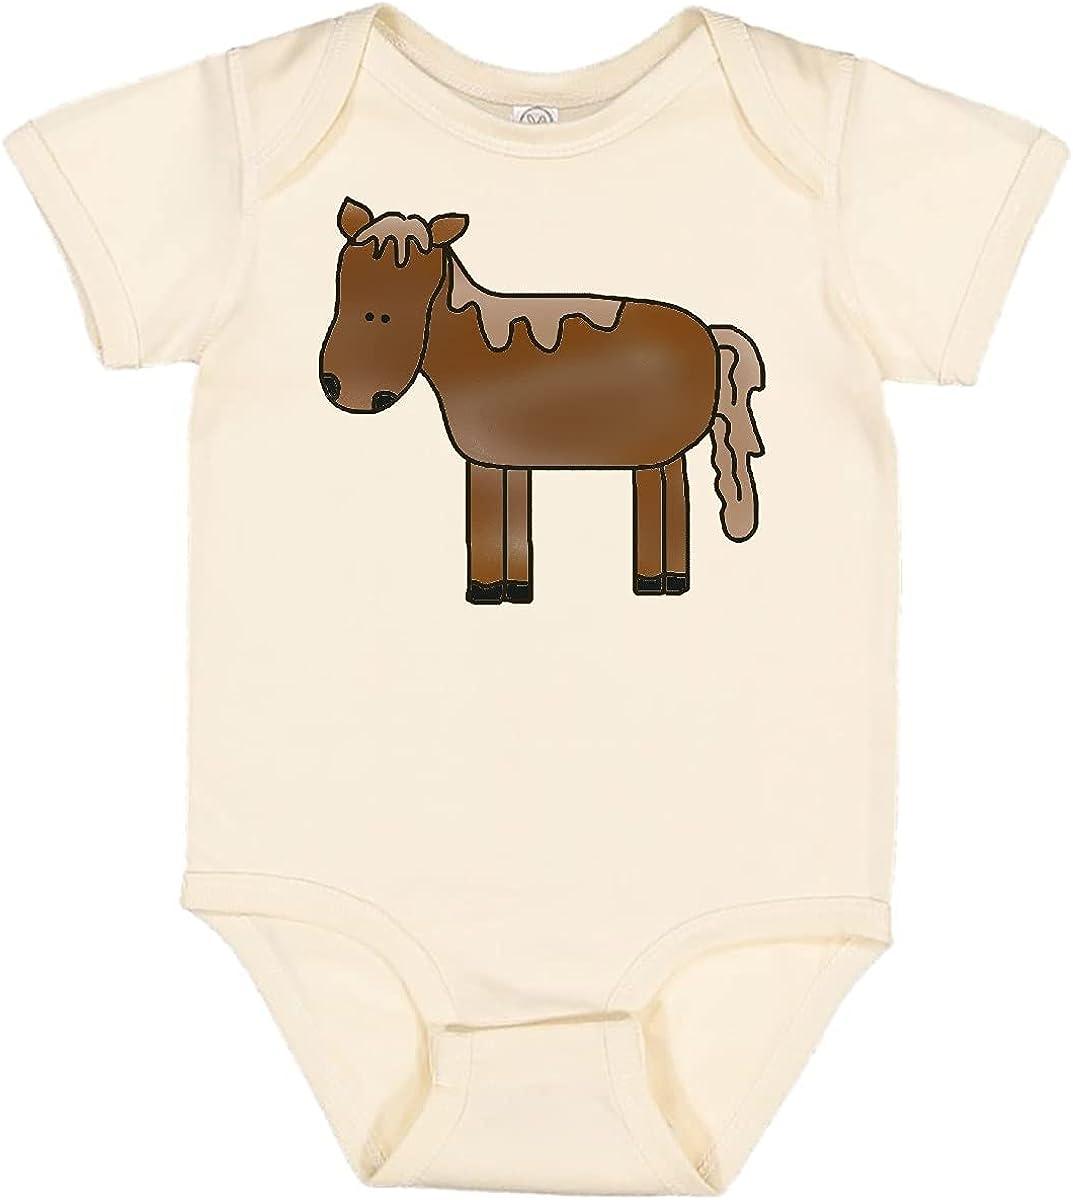 inktastic Horse Over item handling Infant Max 62% OFF Creeper